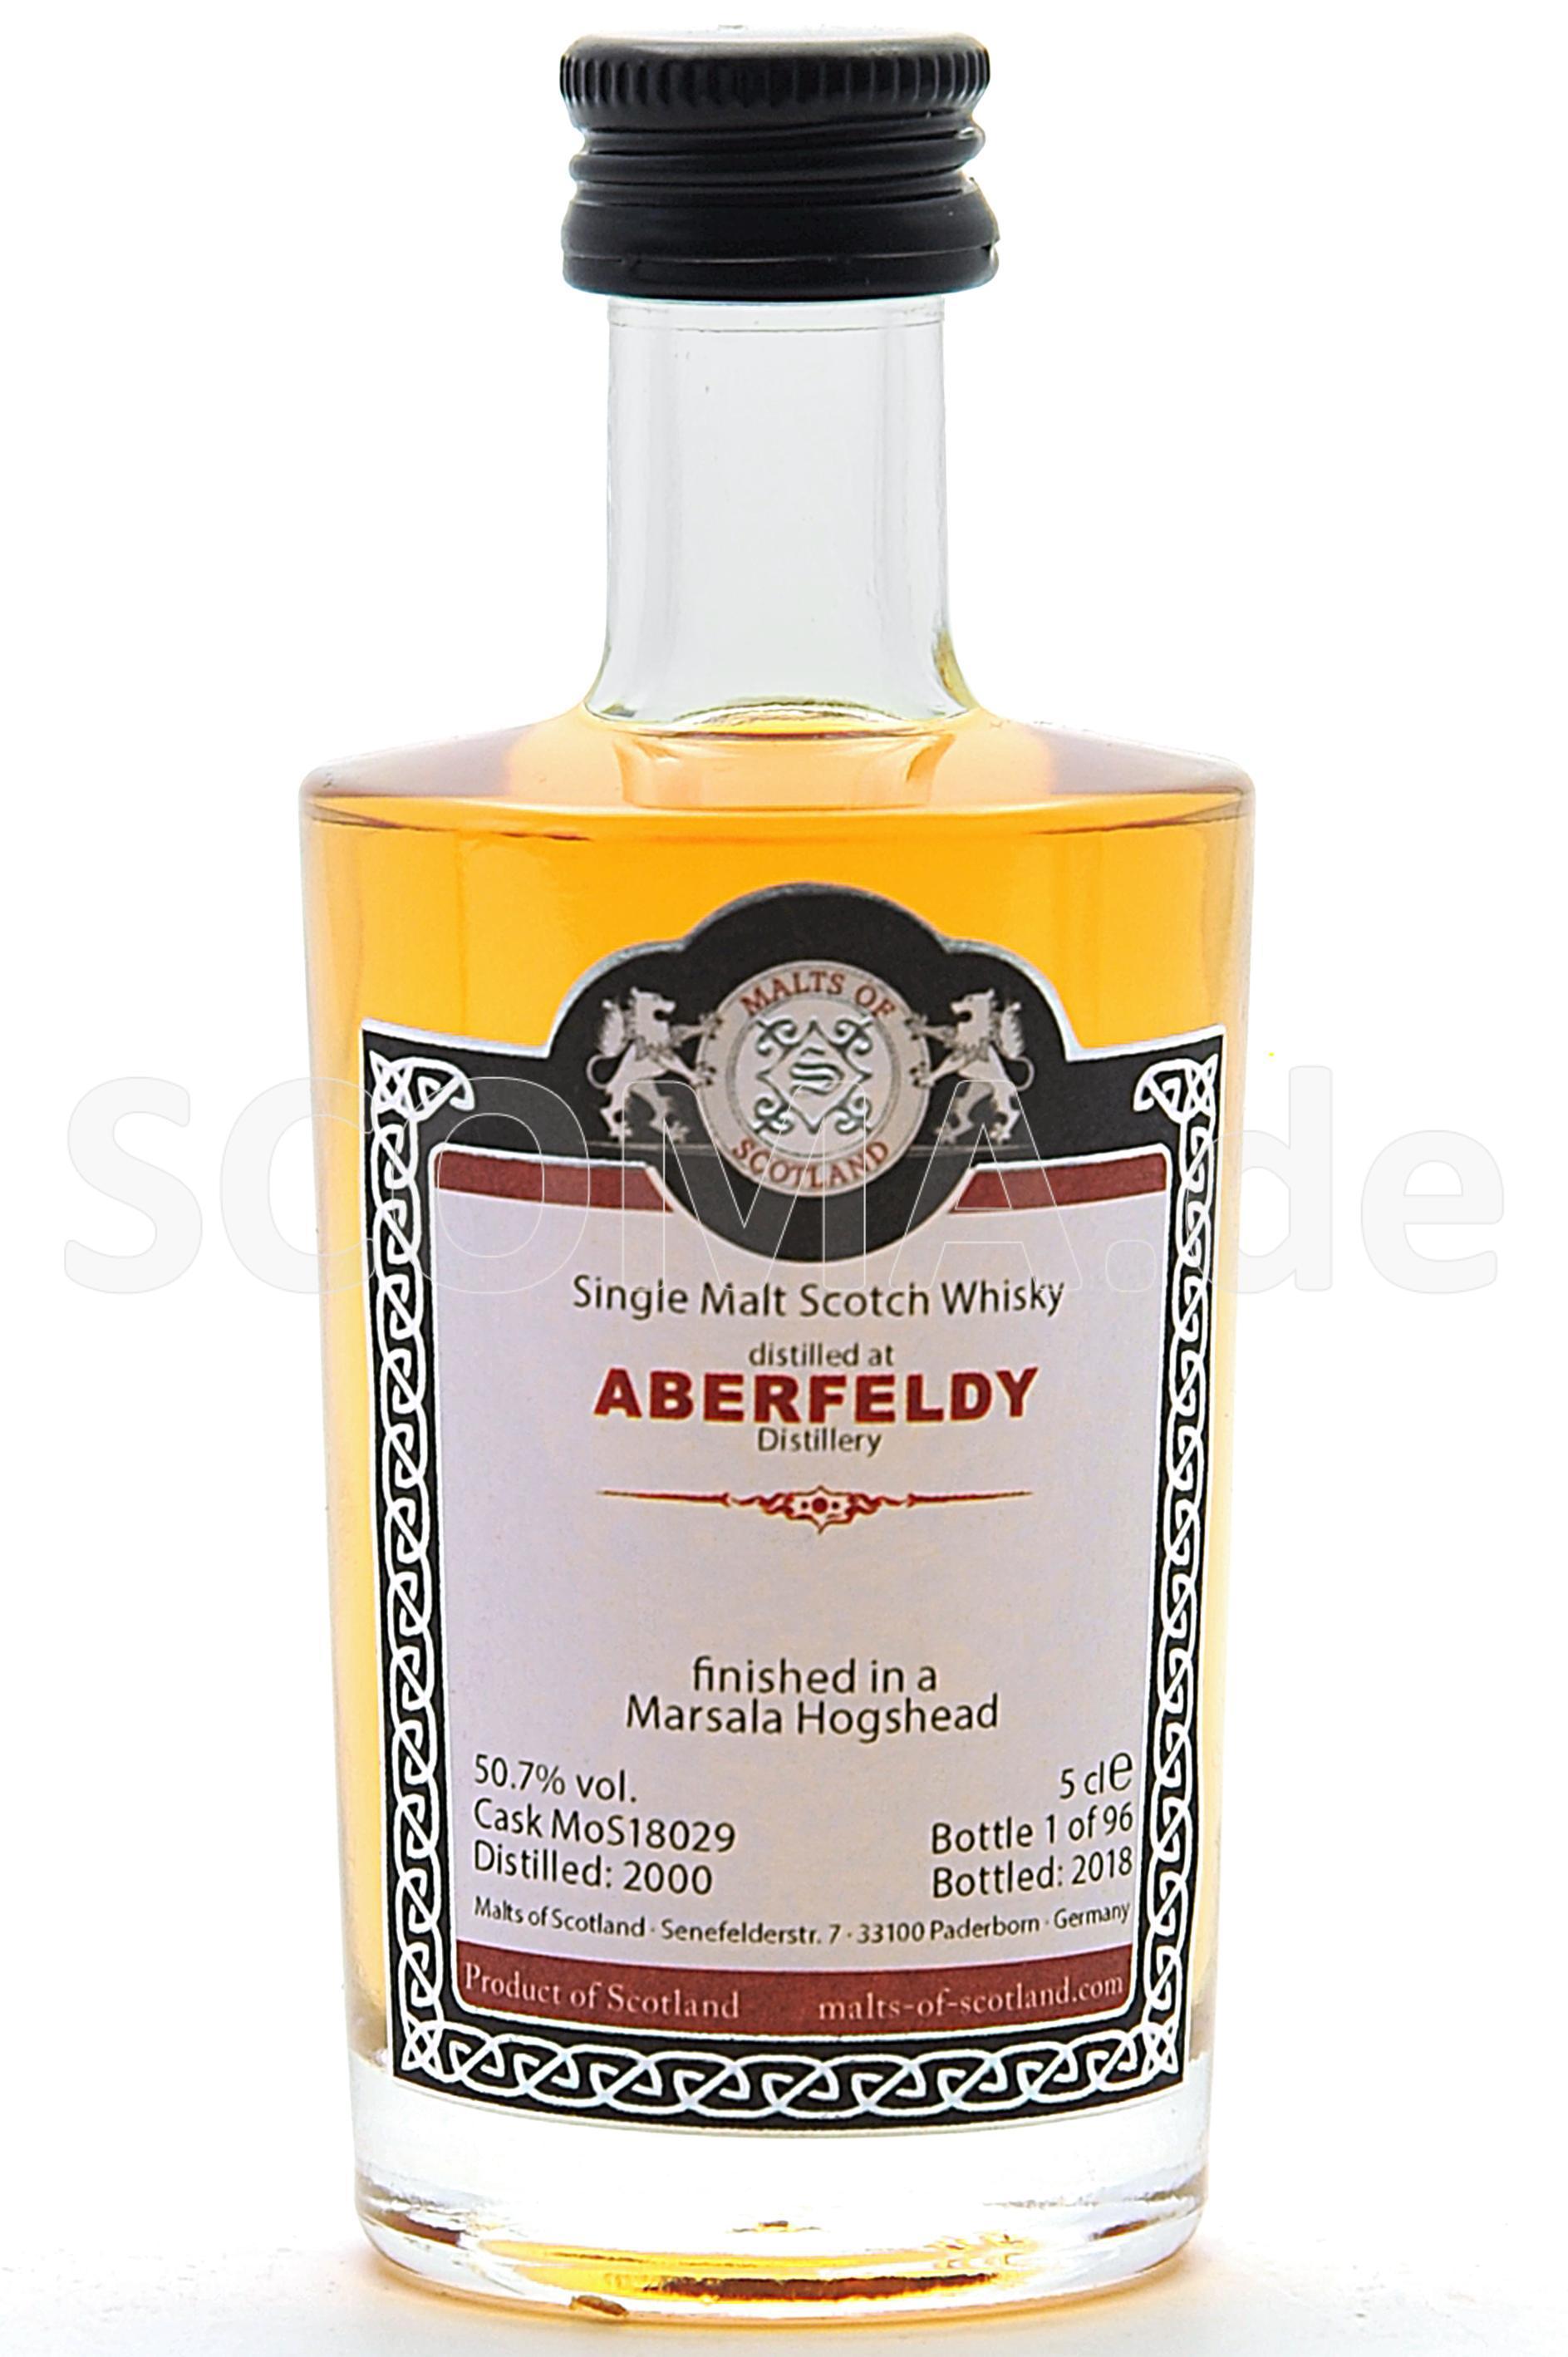 Aberfeldy 2000/2018 Marsala Fi...